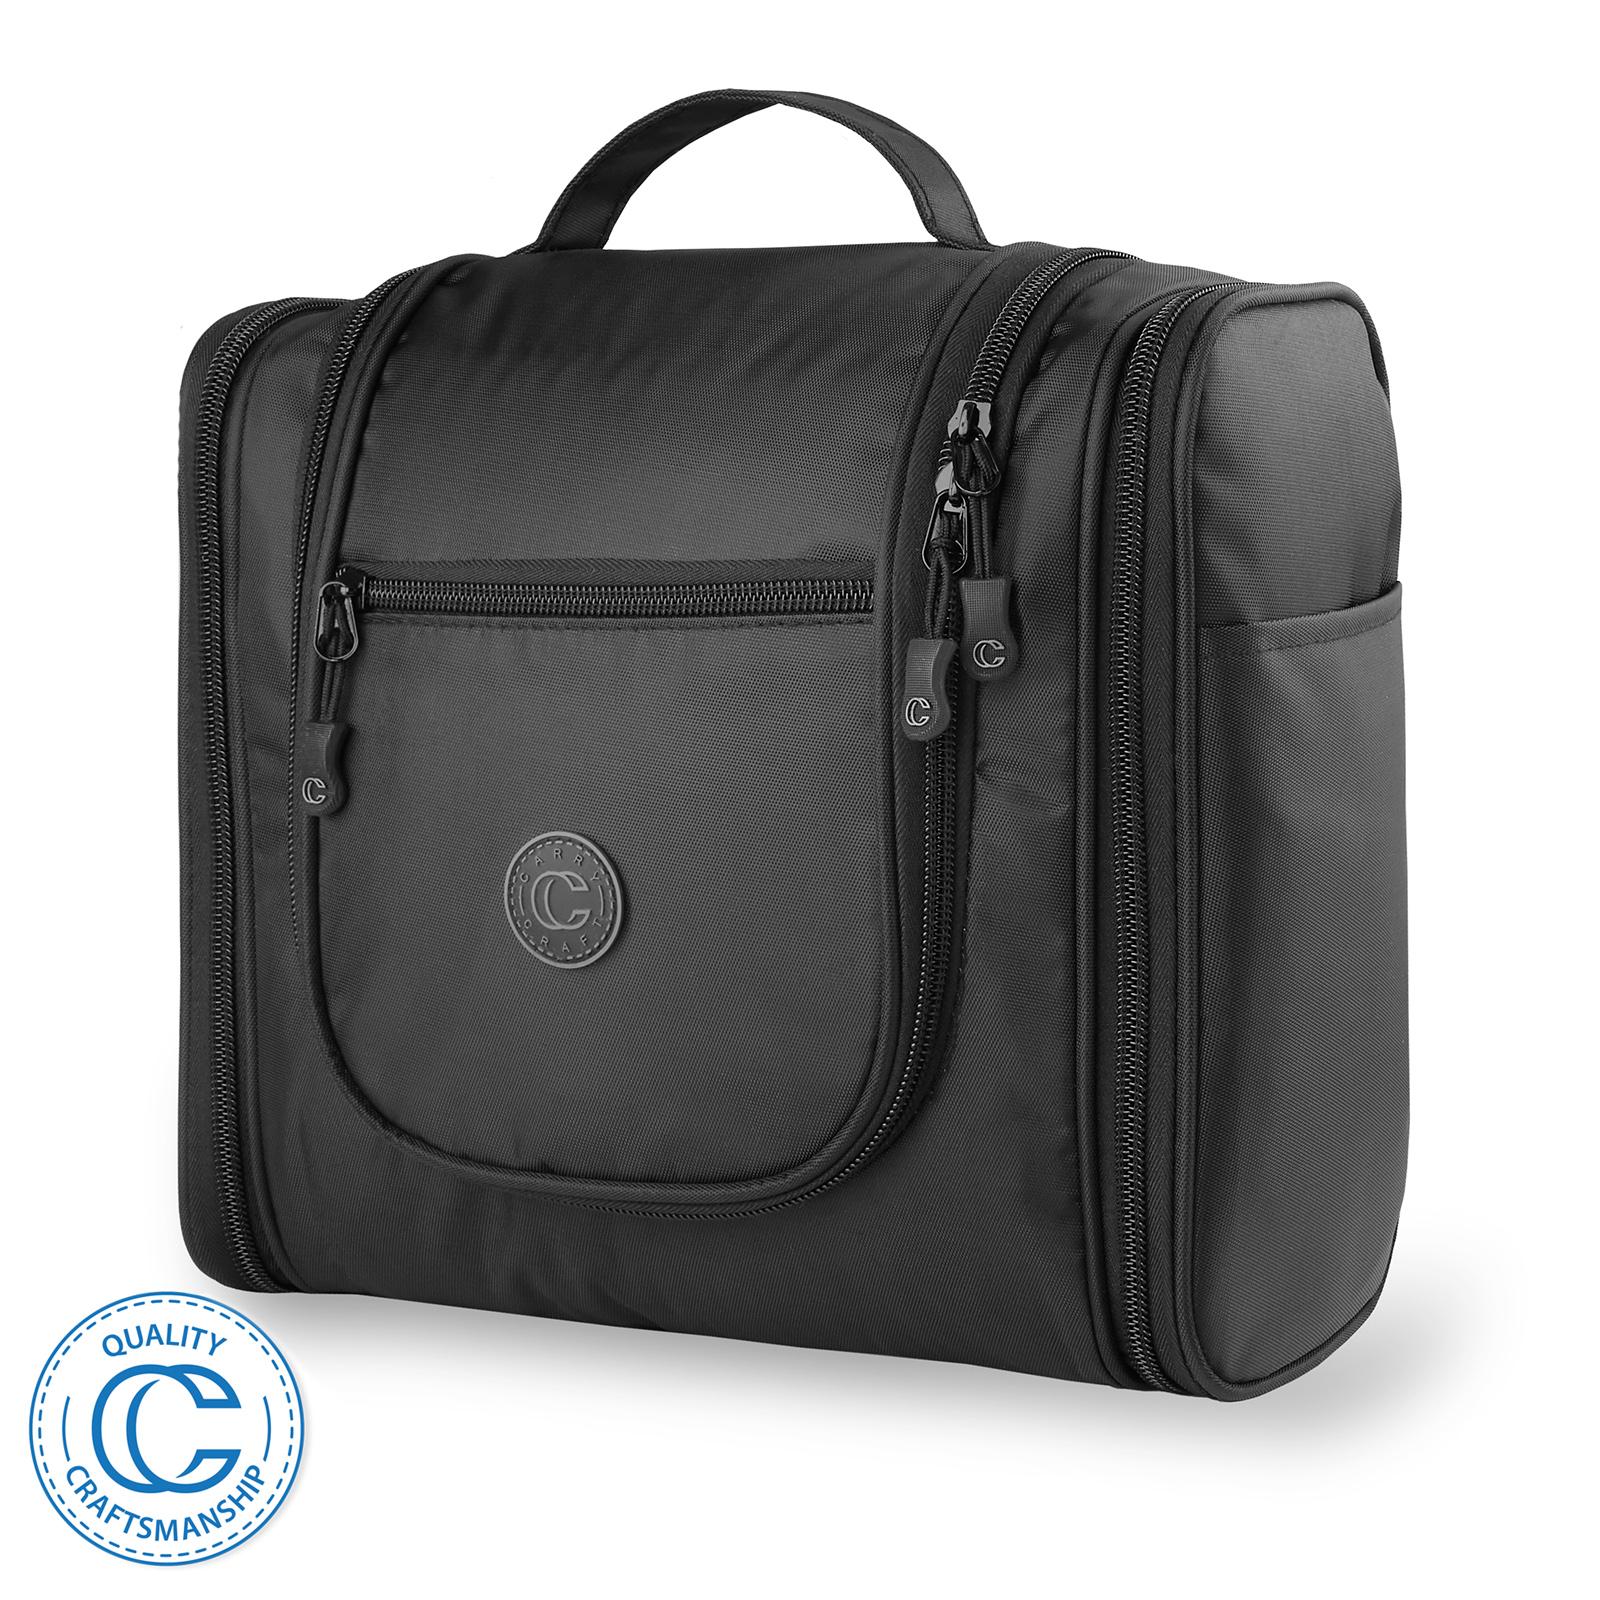 569bcbdb2c Details about Hanging Travel Toiletry Bag Organizer Case for Shaving Kit  Makeup Etc.